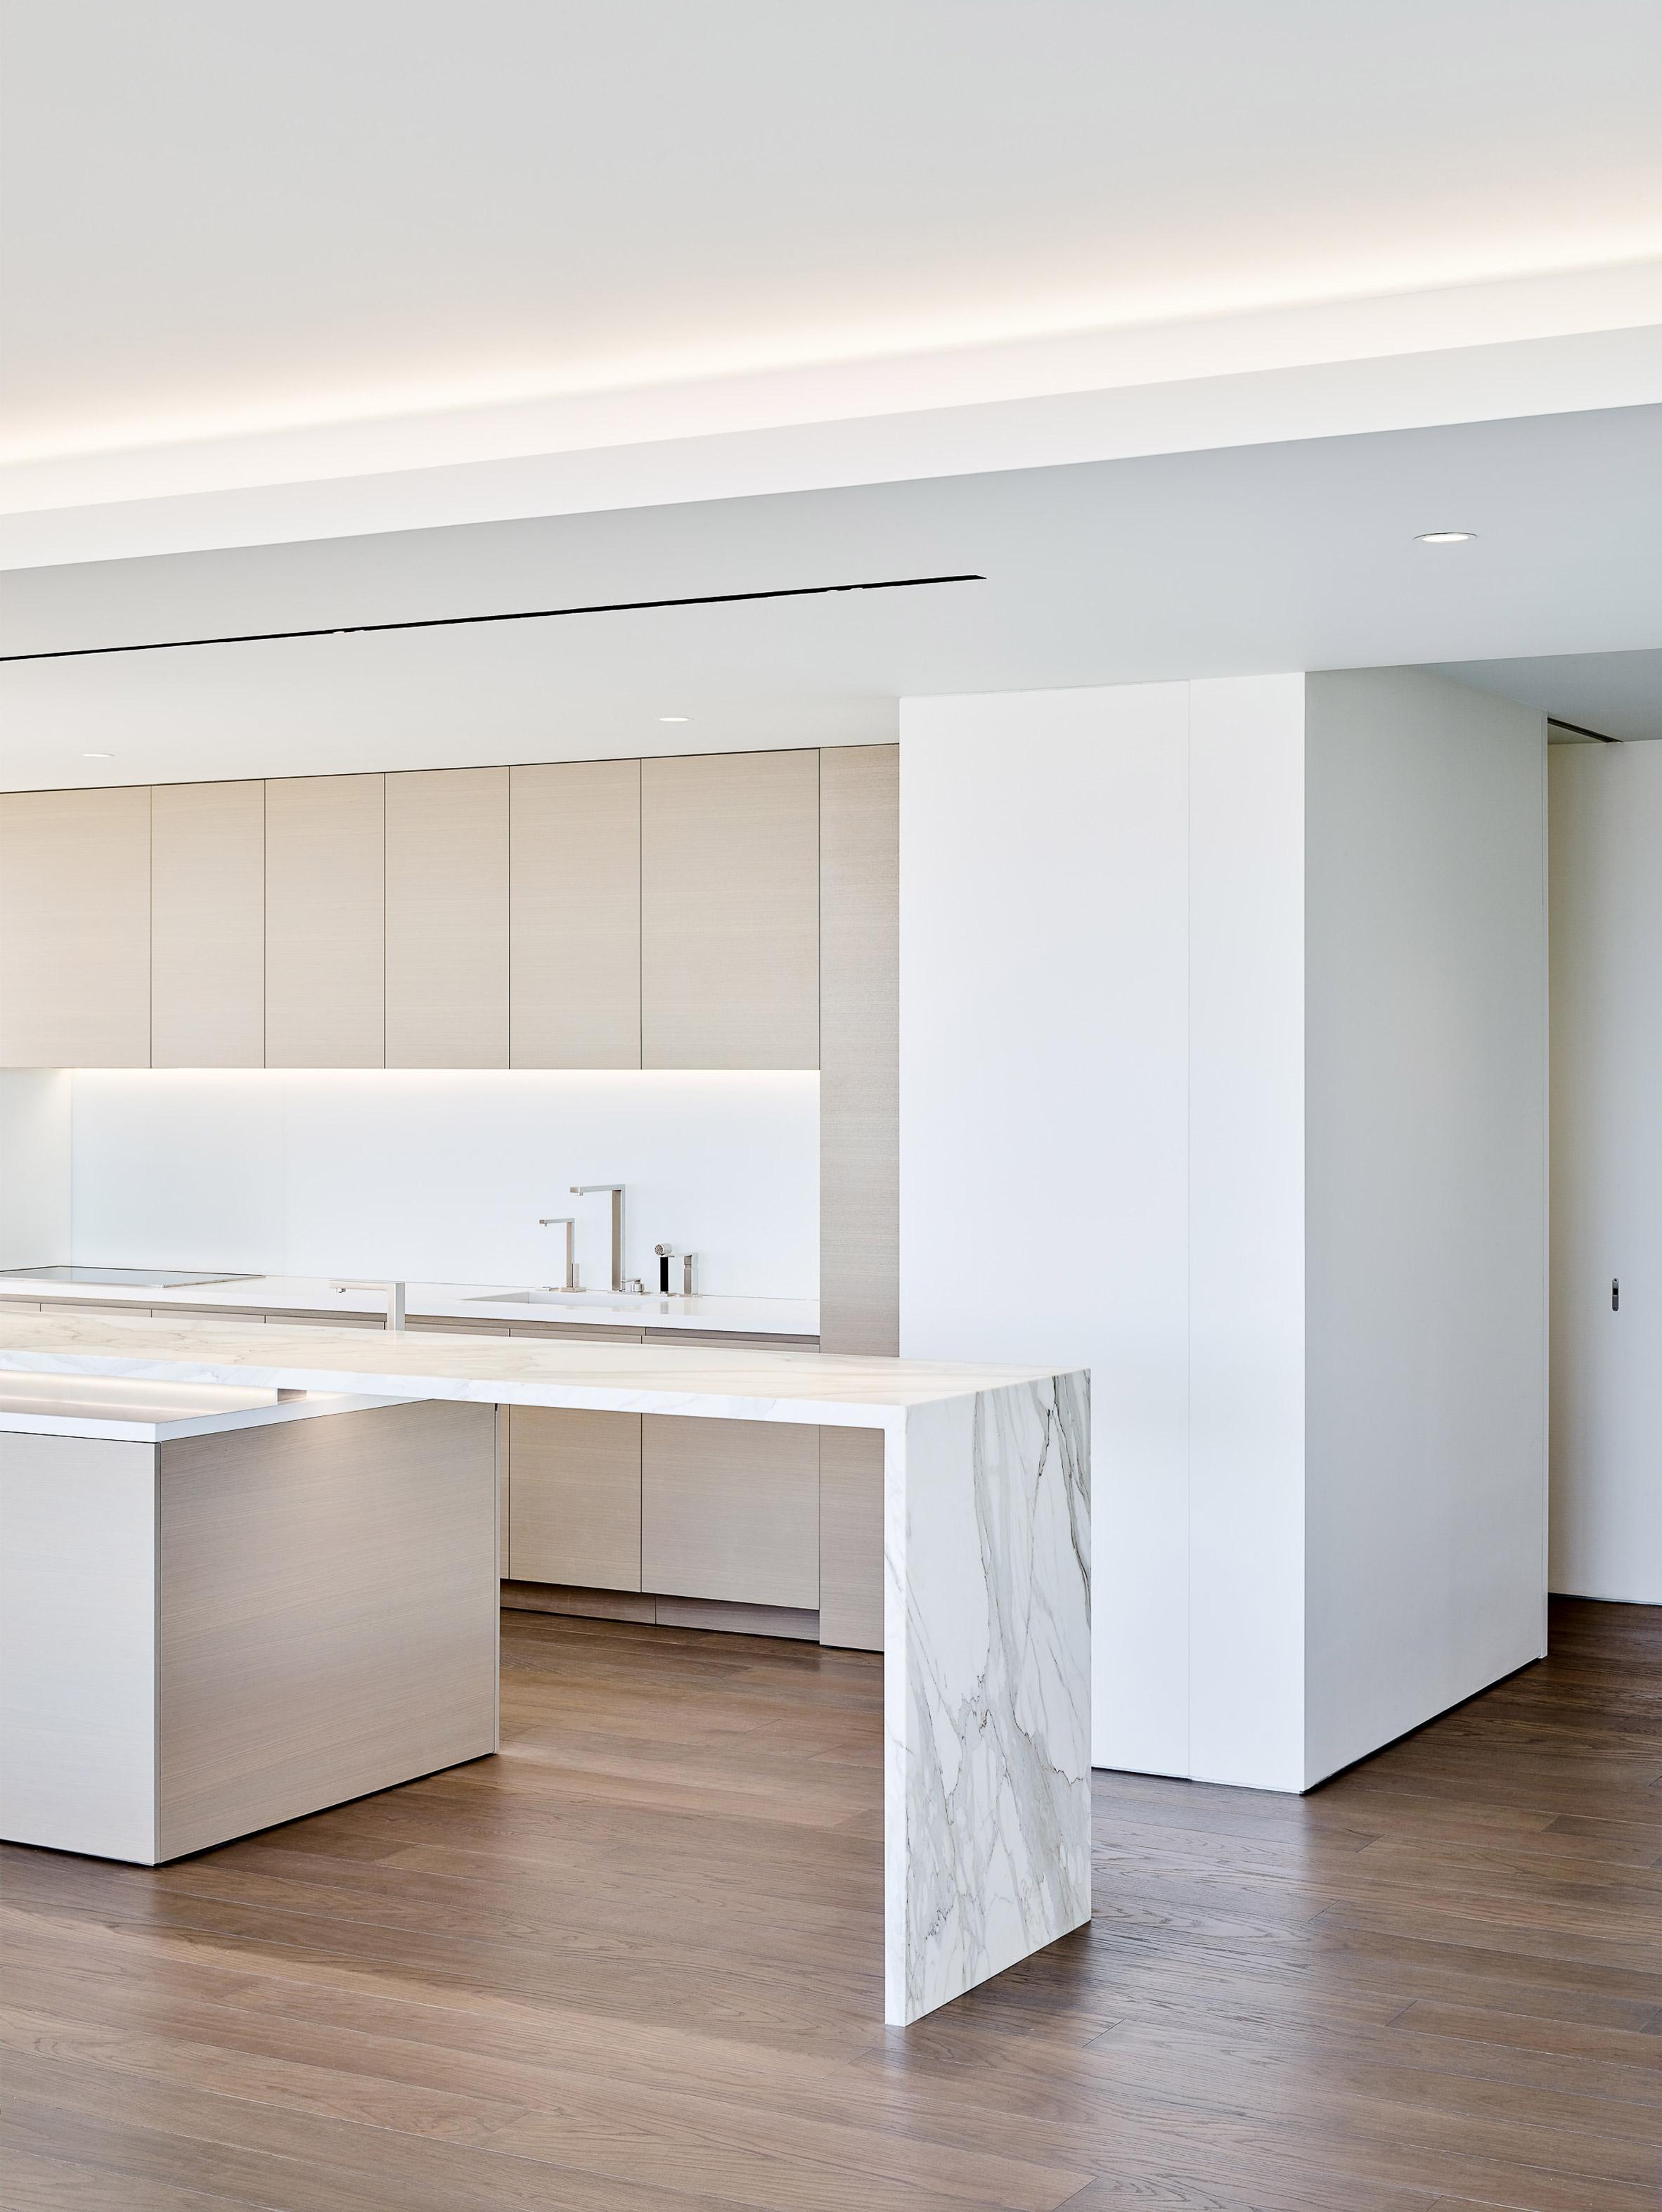 Private Residence 4 by Garcia Tamjidi Architecture Design